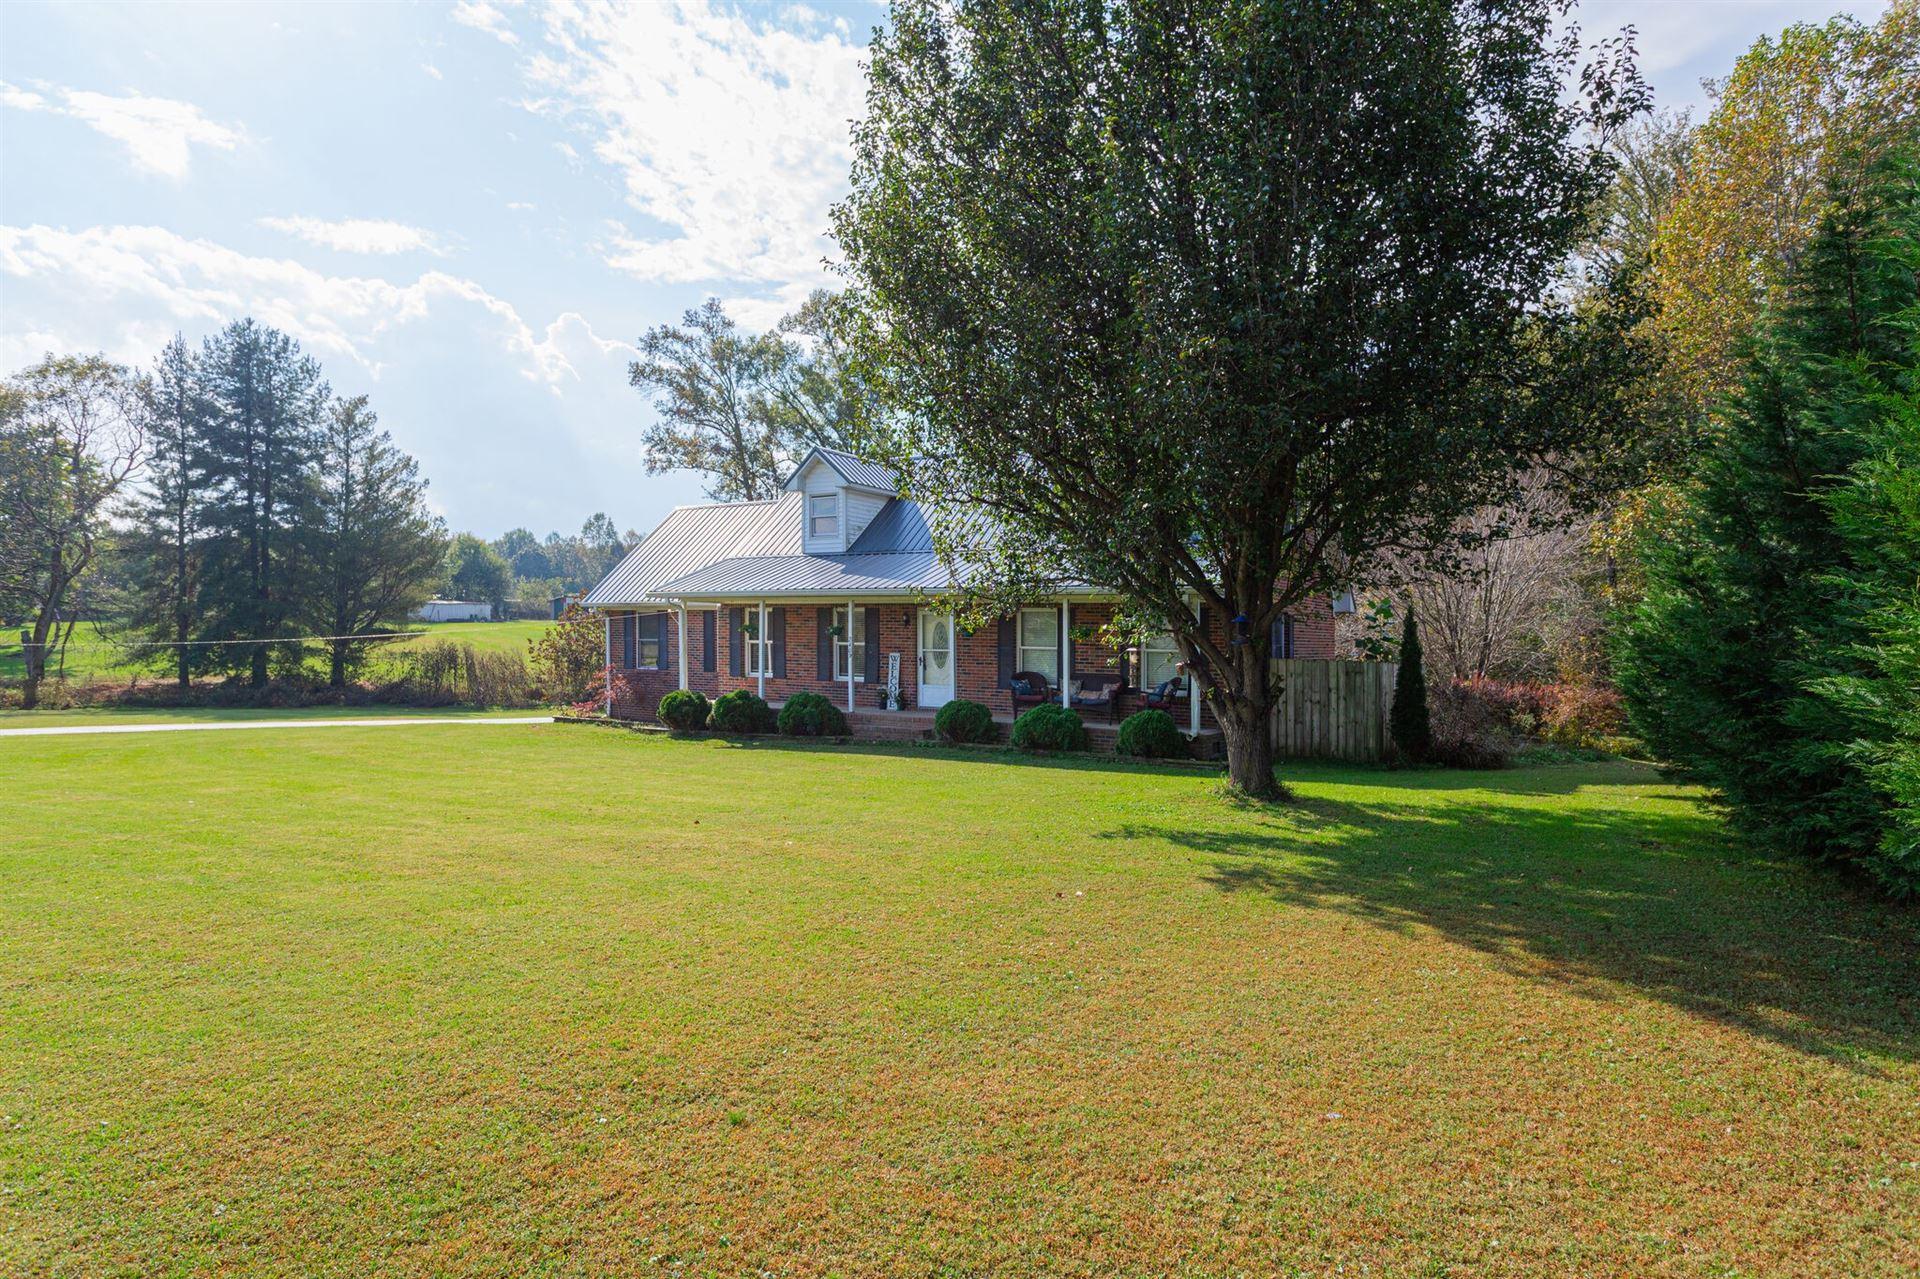 Photo of 2409 Eugene Reed Road, Woodbury, TN 37190 (MLS # 2302918)